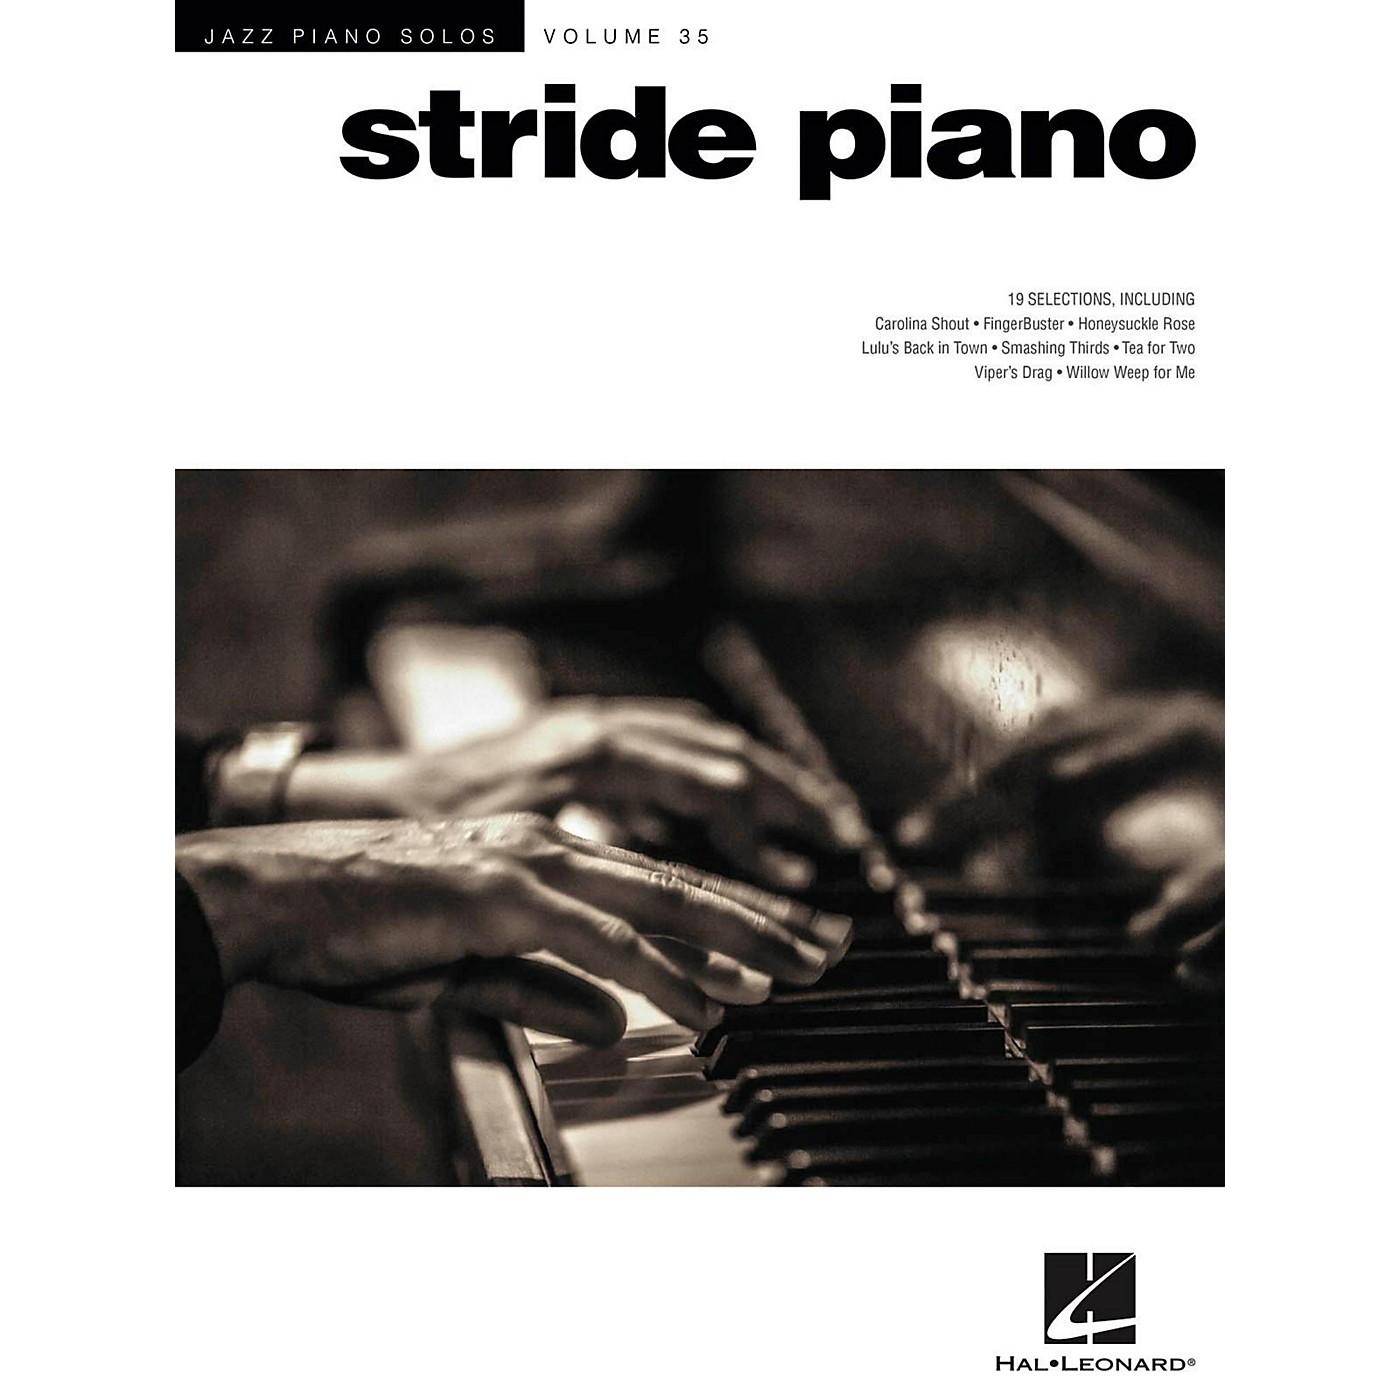 Hal Leonard Stride Piano - Jazz Piano Solos Series Vol. 35 thumbnail